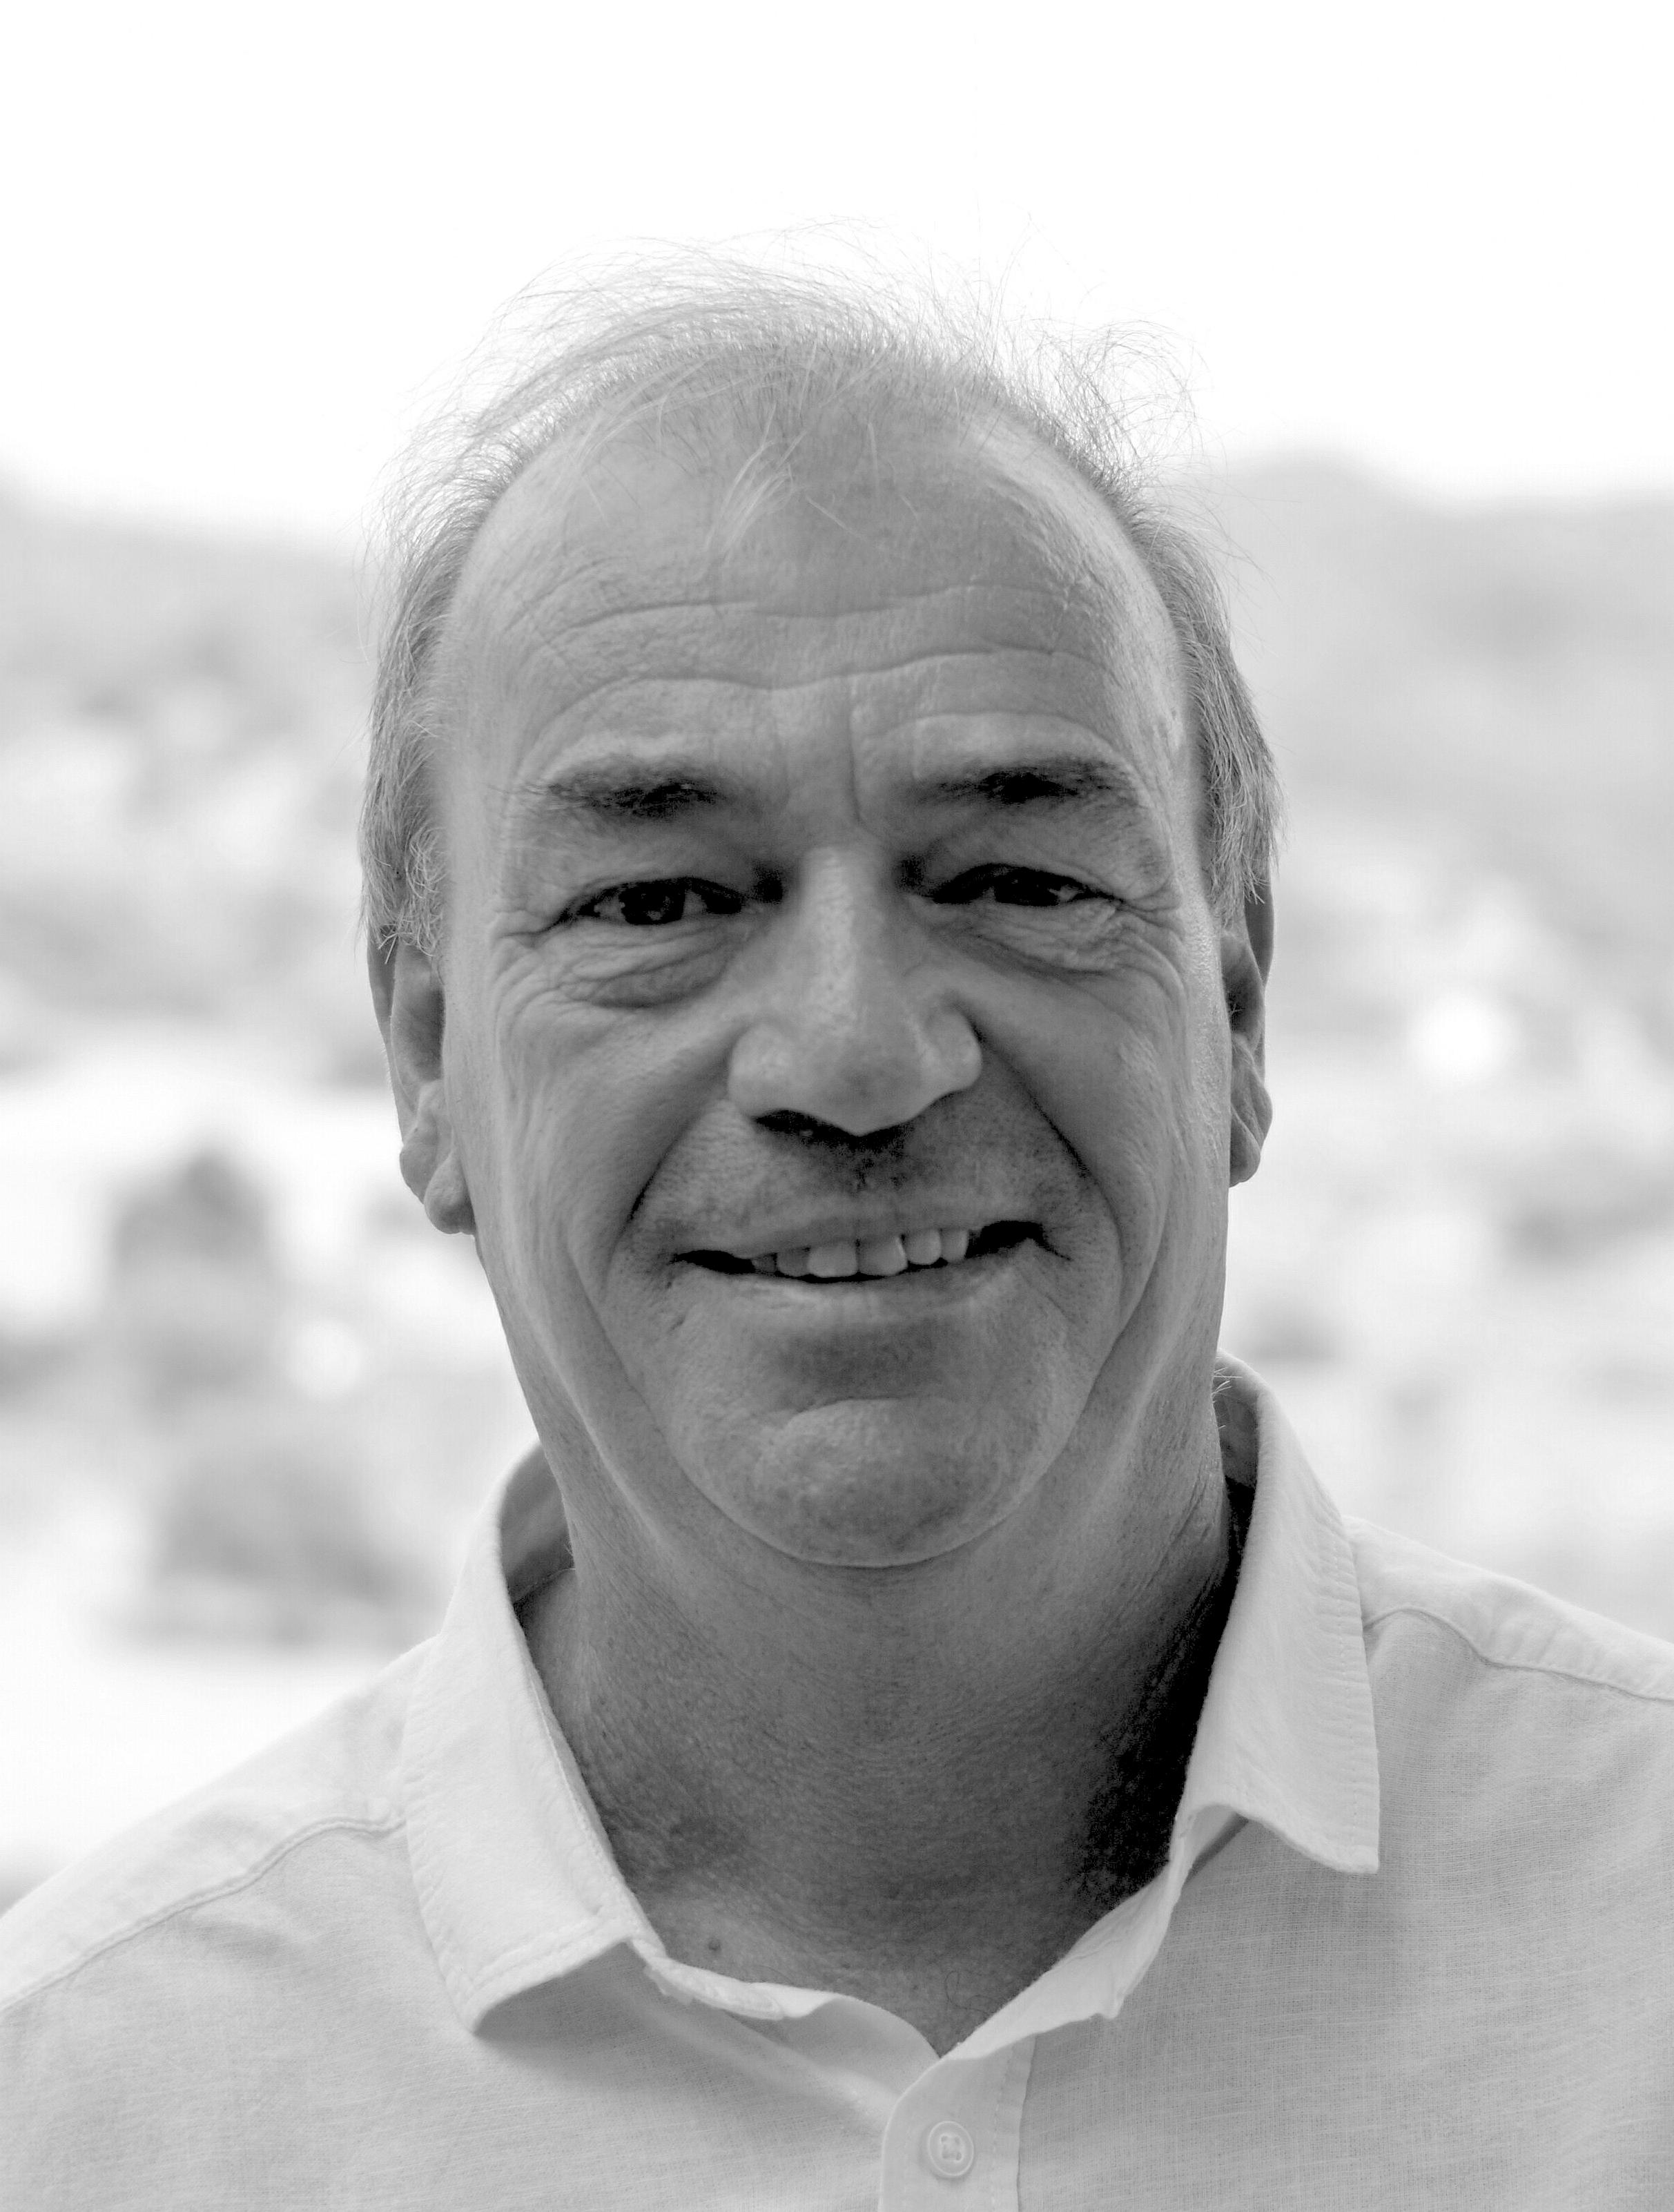 Patrick Yeoward, Senior Superyacht Consultant